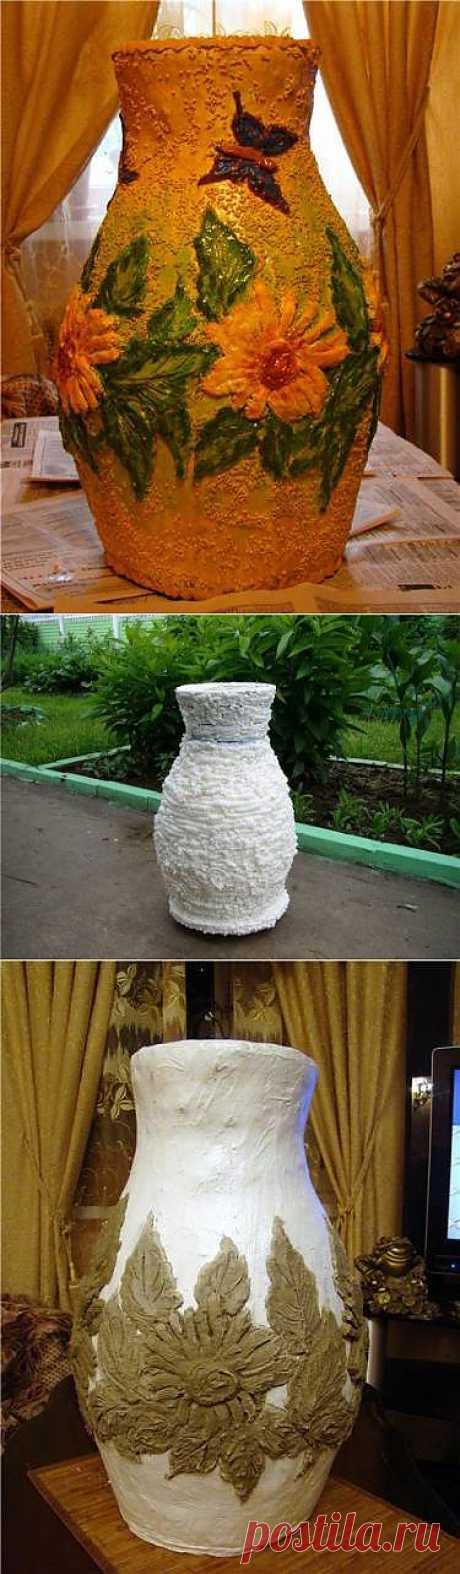 Кувшин-ваза для сада. Пошаговые фото.